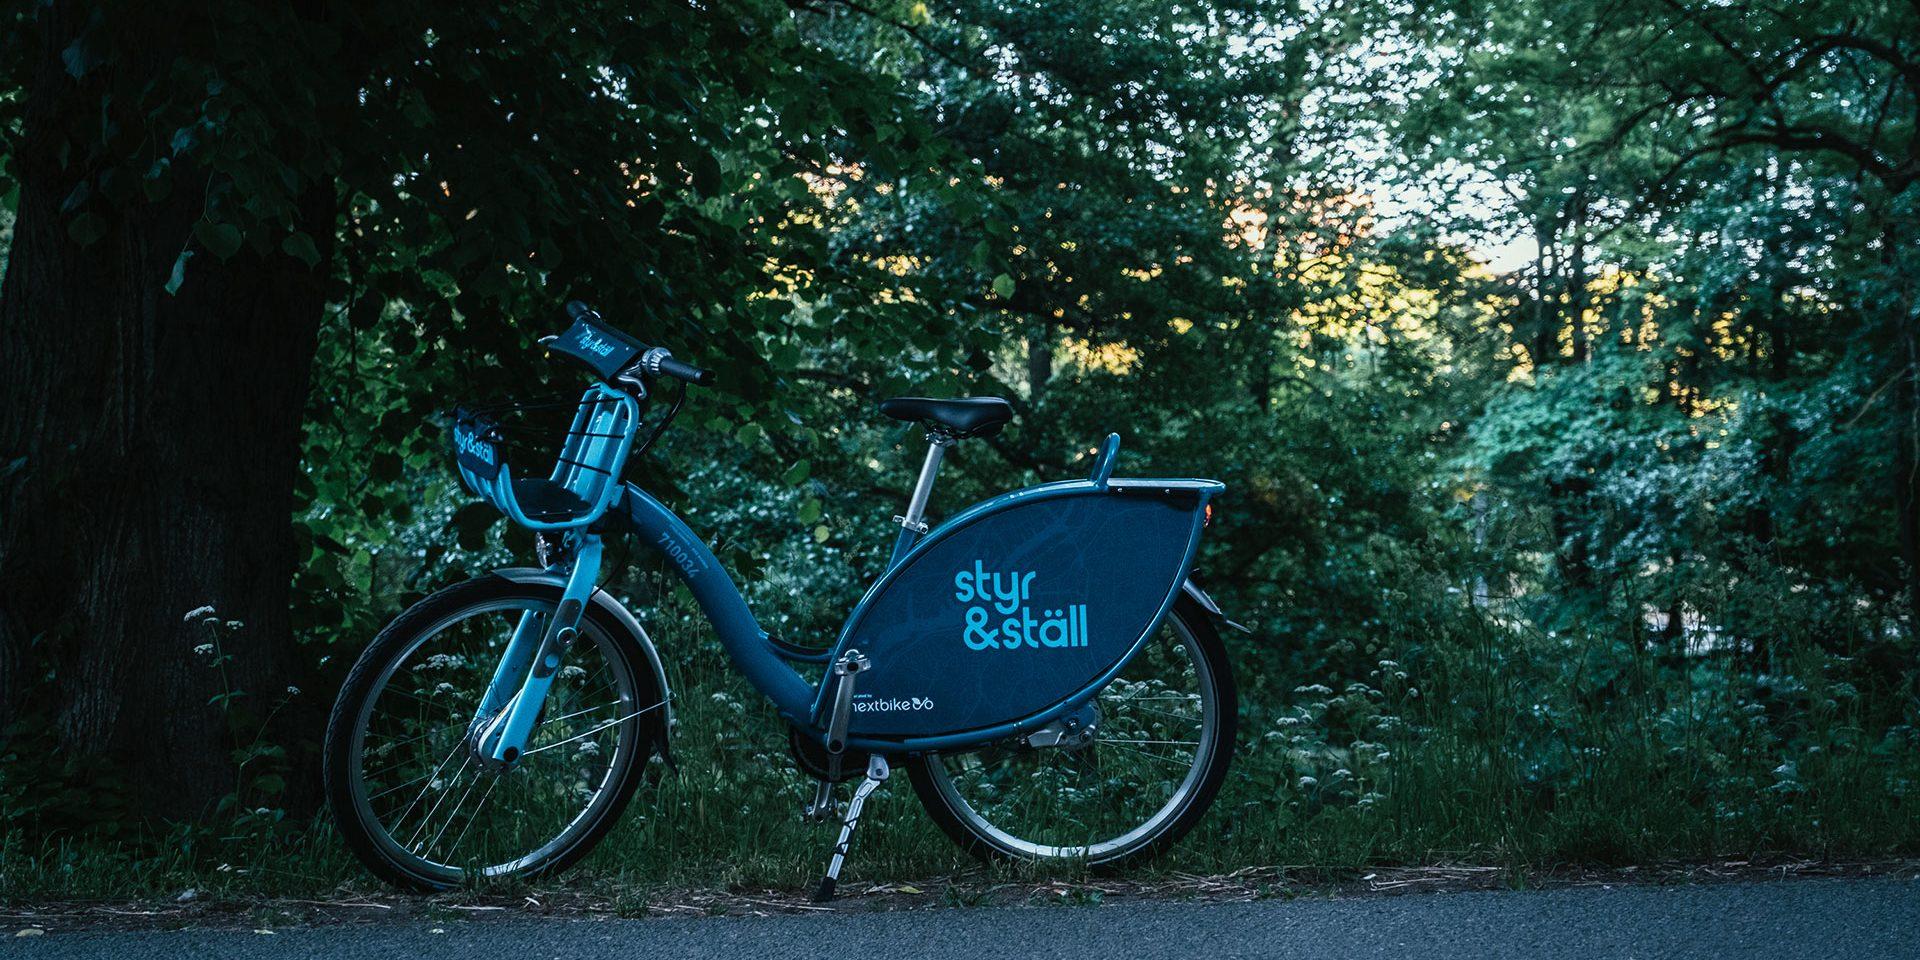 Styr & Ställ Göteborg 2020 Nextbike